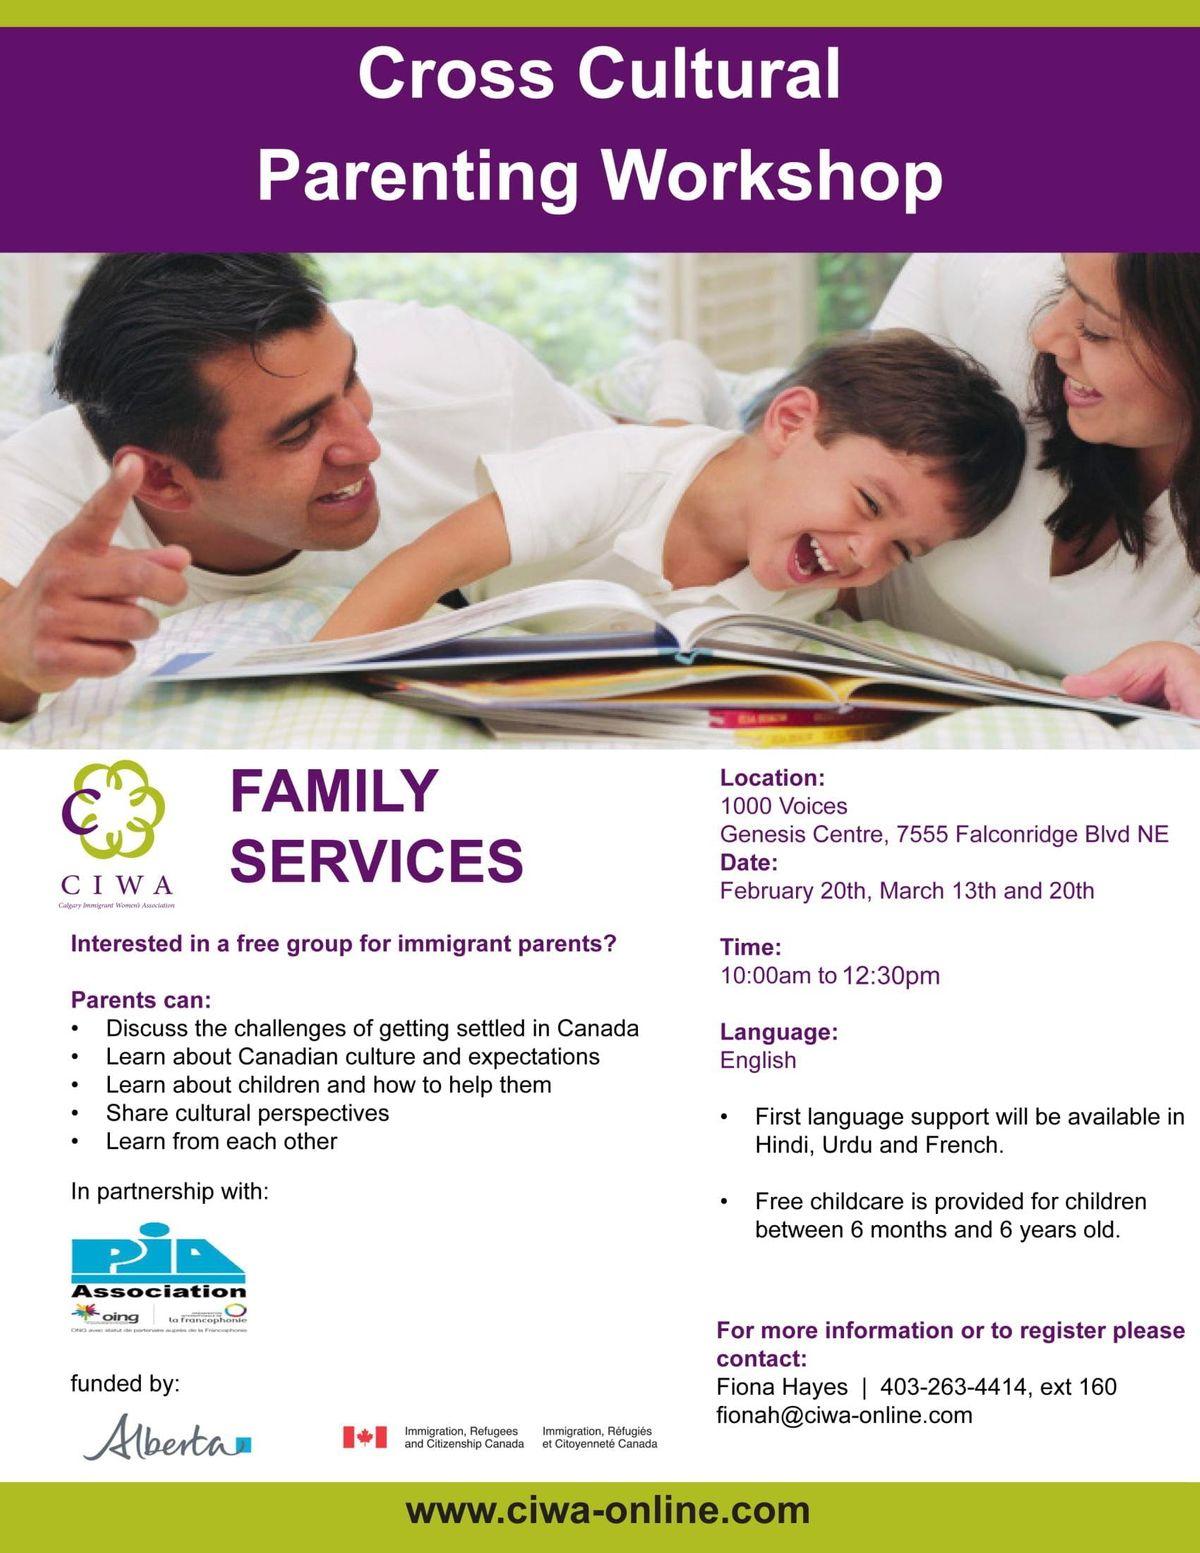 Cross Cultural Parenting Workshop